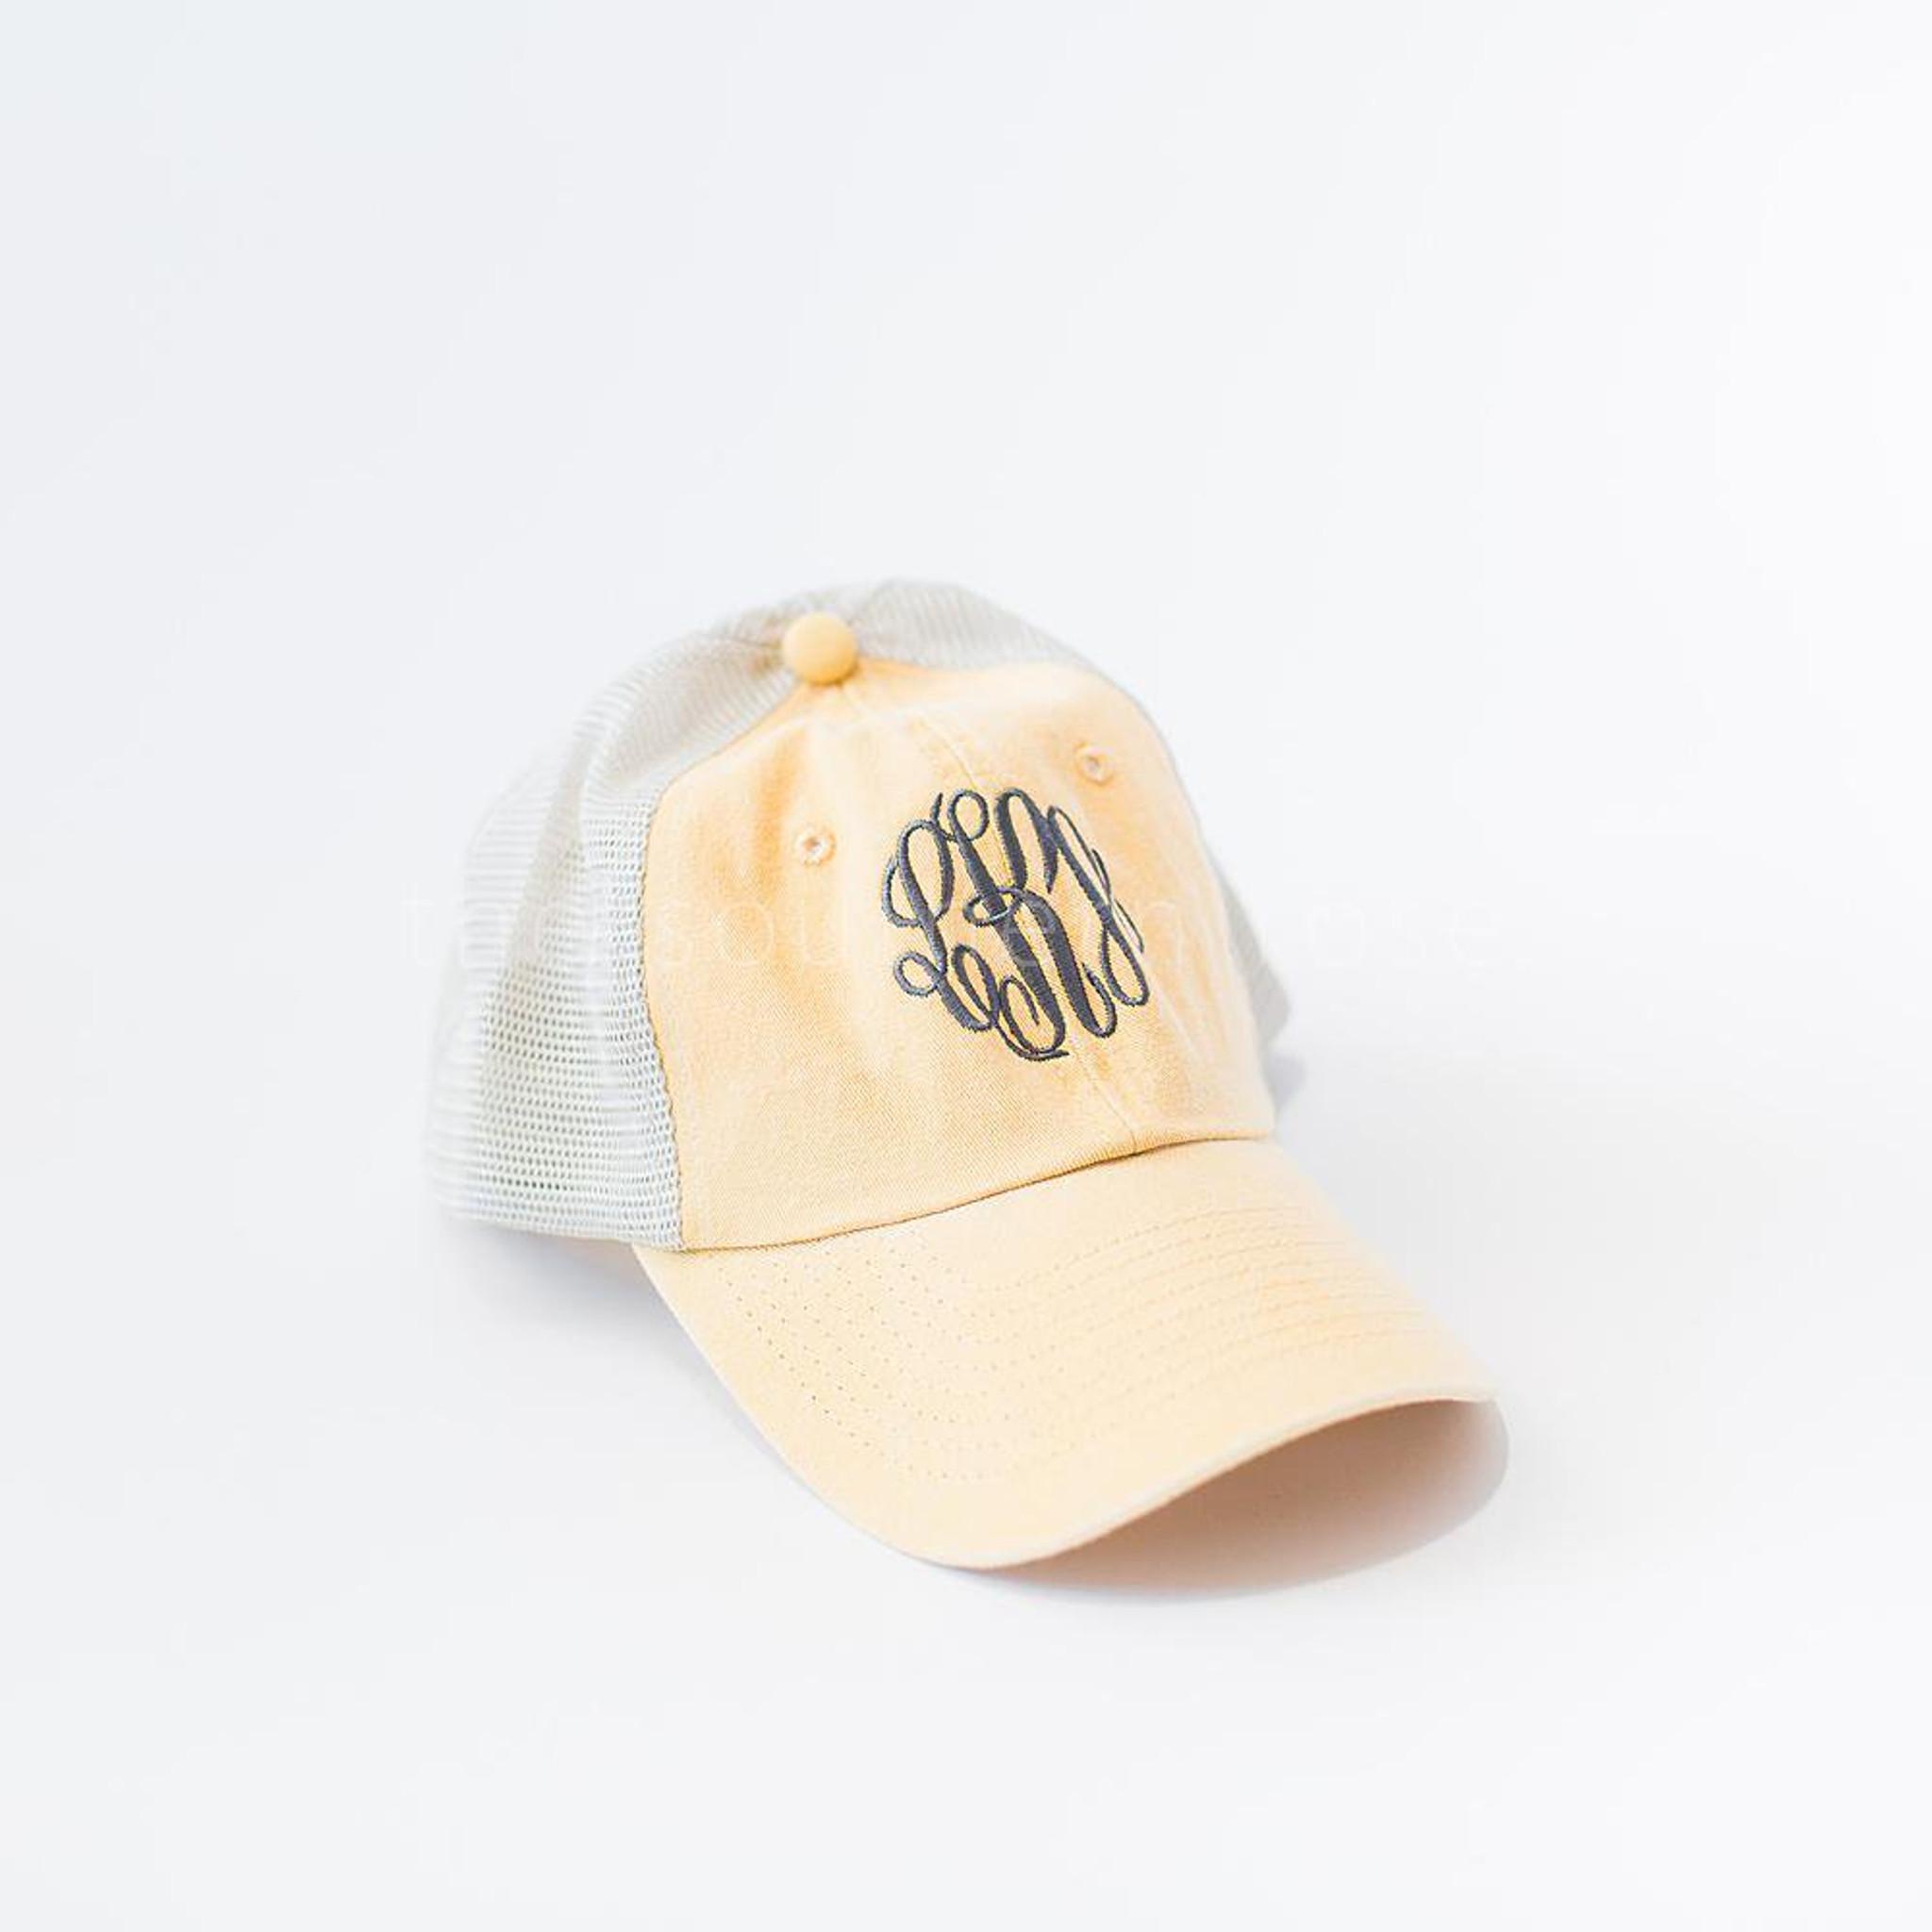 A pale yellow monogrammed trucker hat.